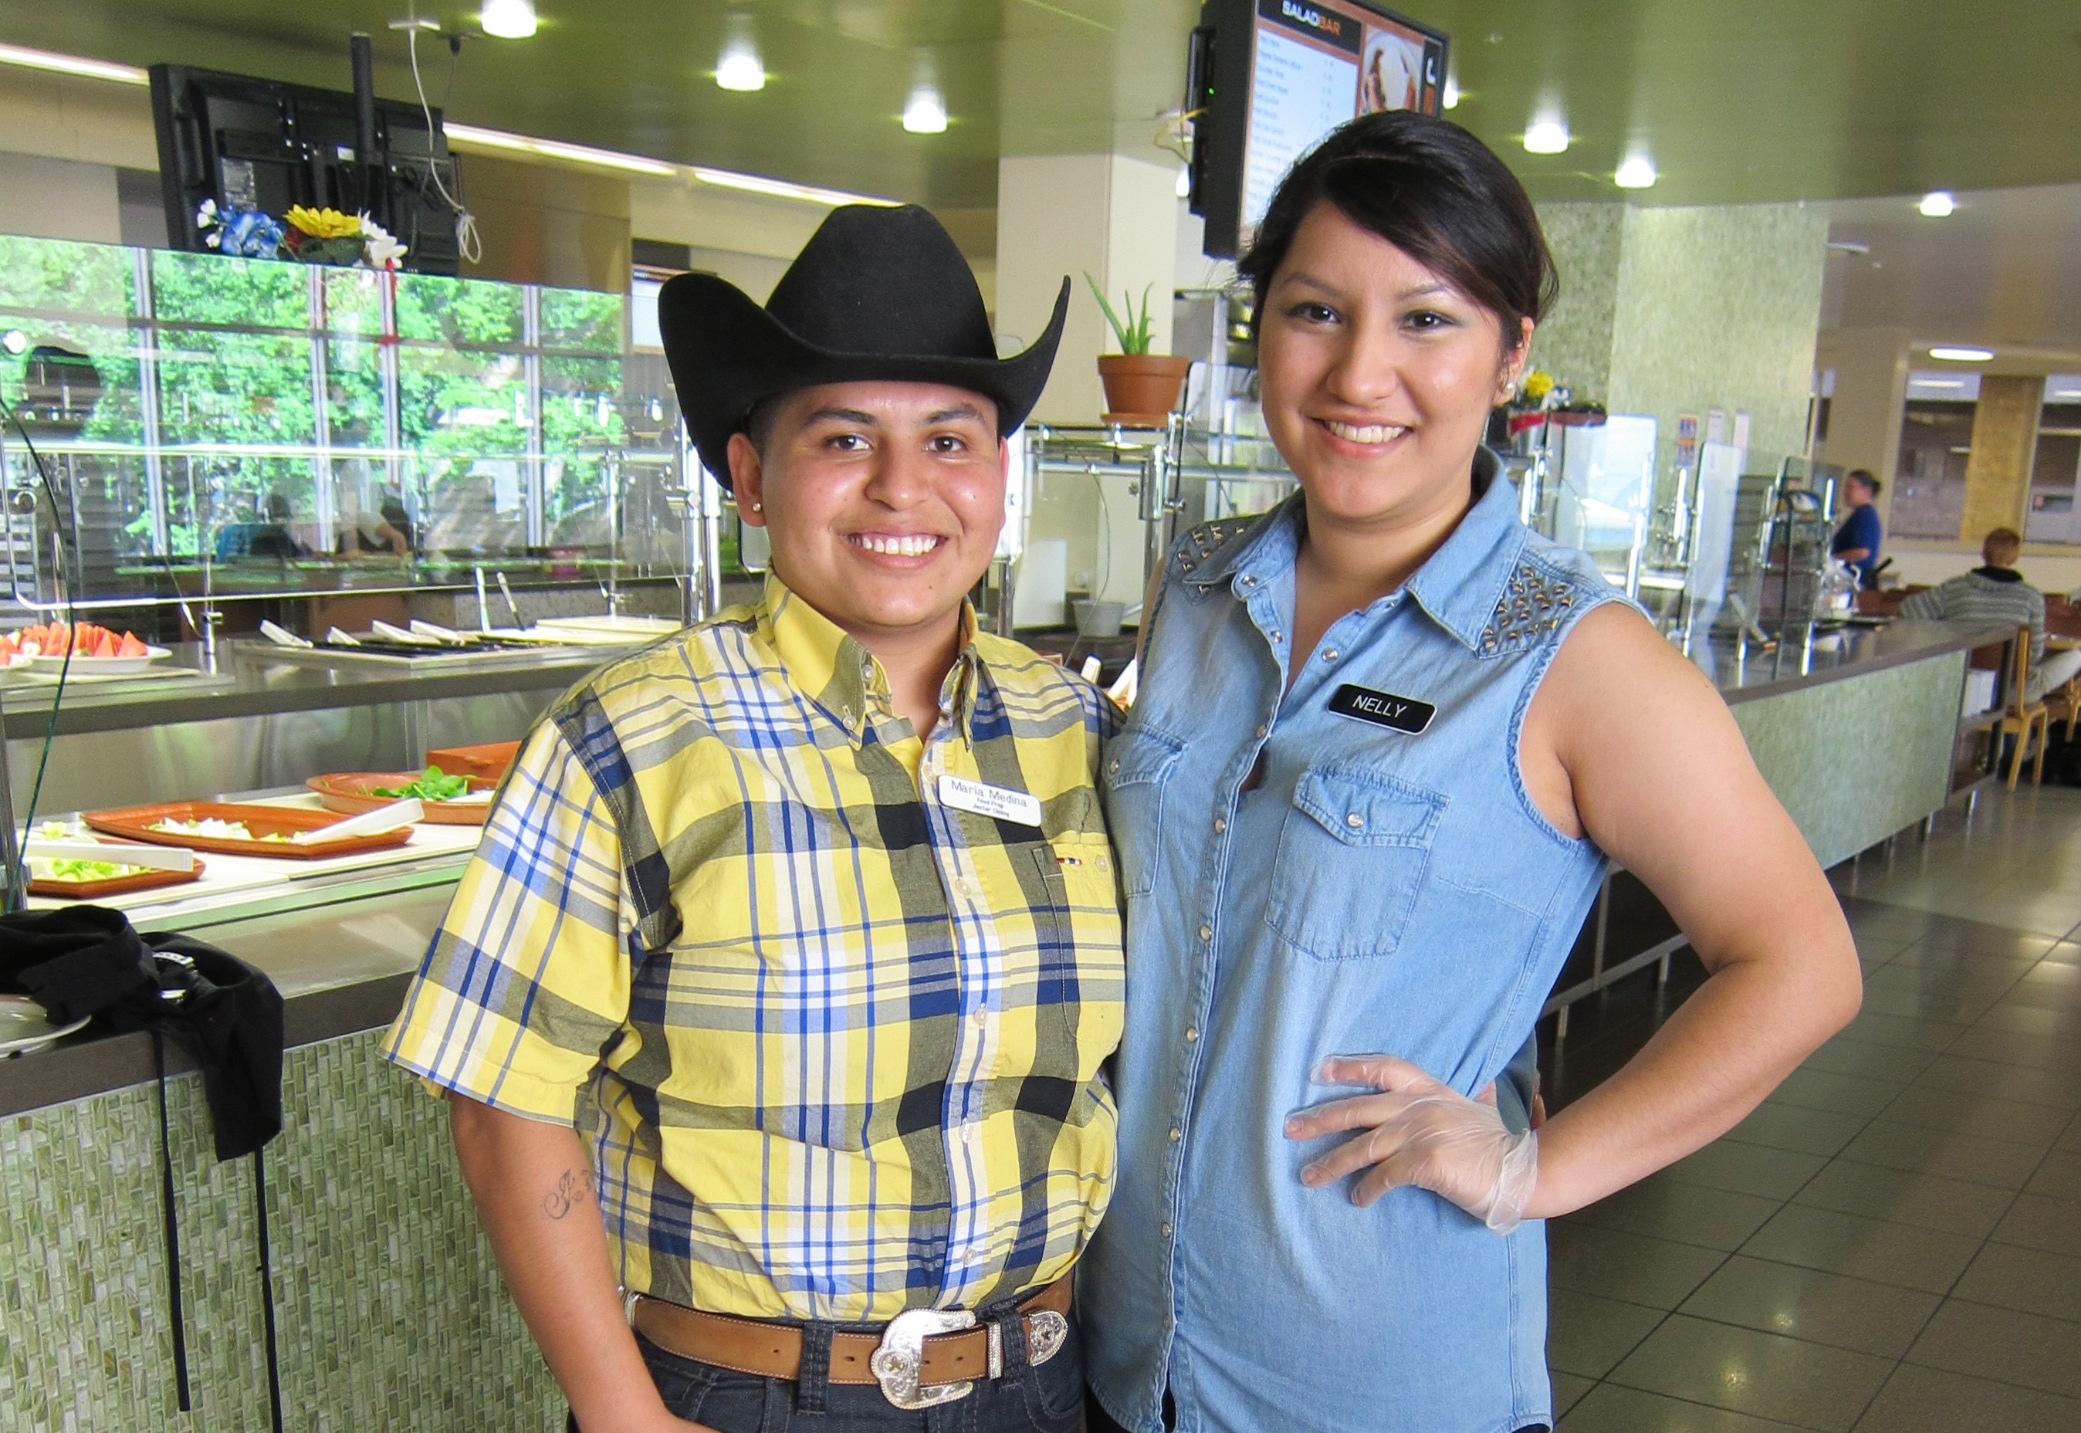 Maria Medina & Nelly Estrada at the Hill Country Dinner